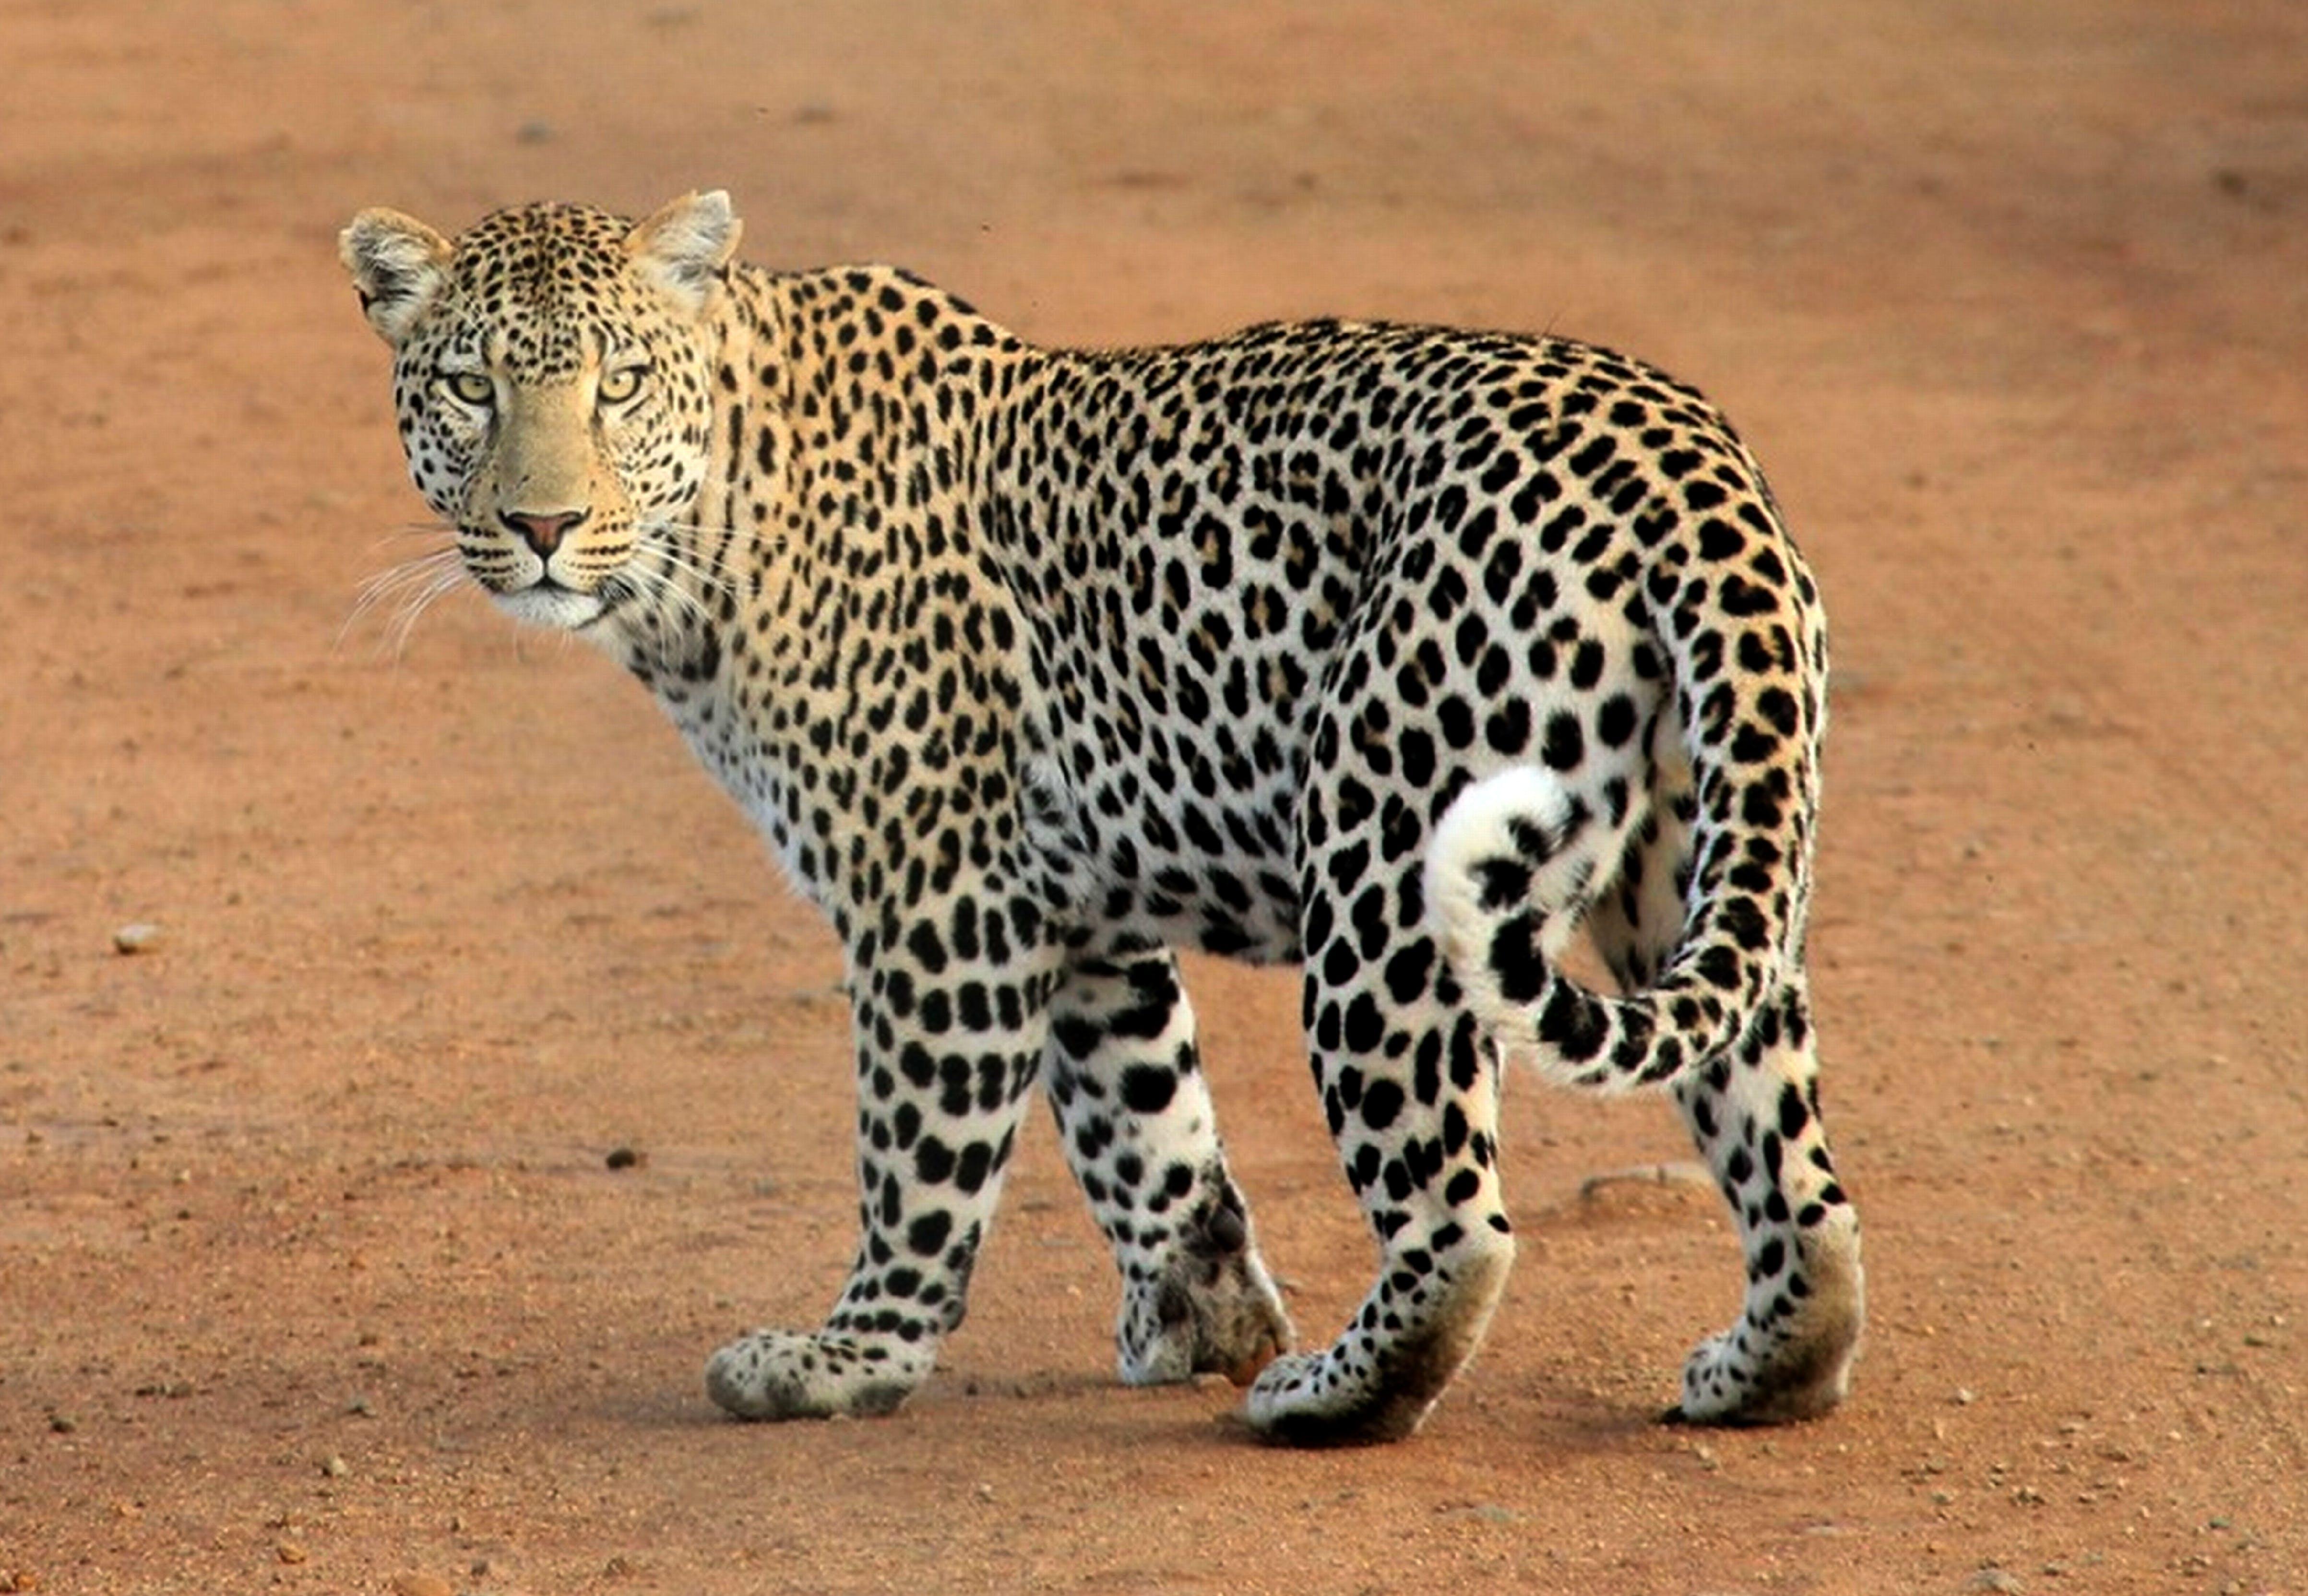 Kostenloses Stock Foto zu leopard, raubtier, safari, tier